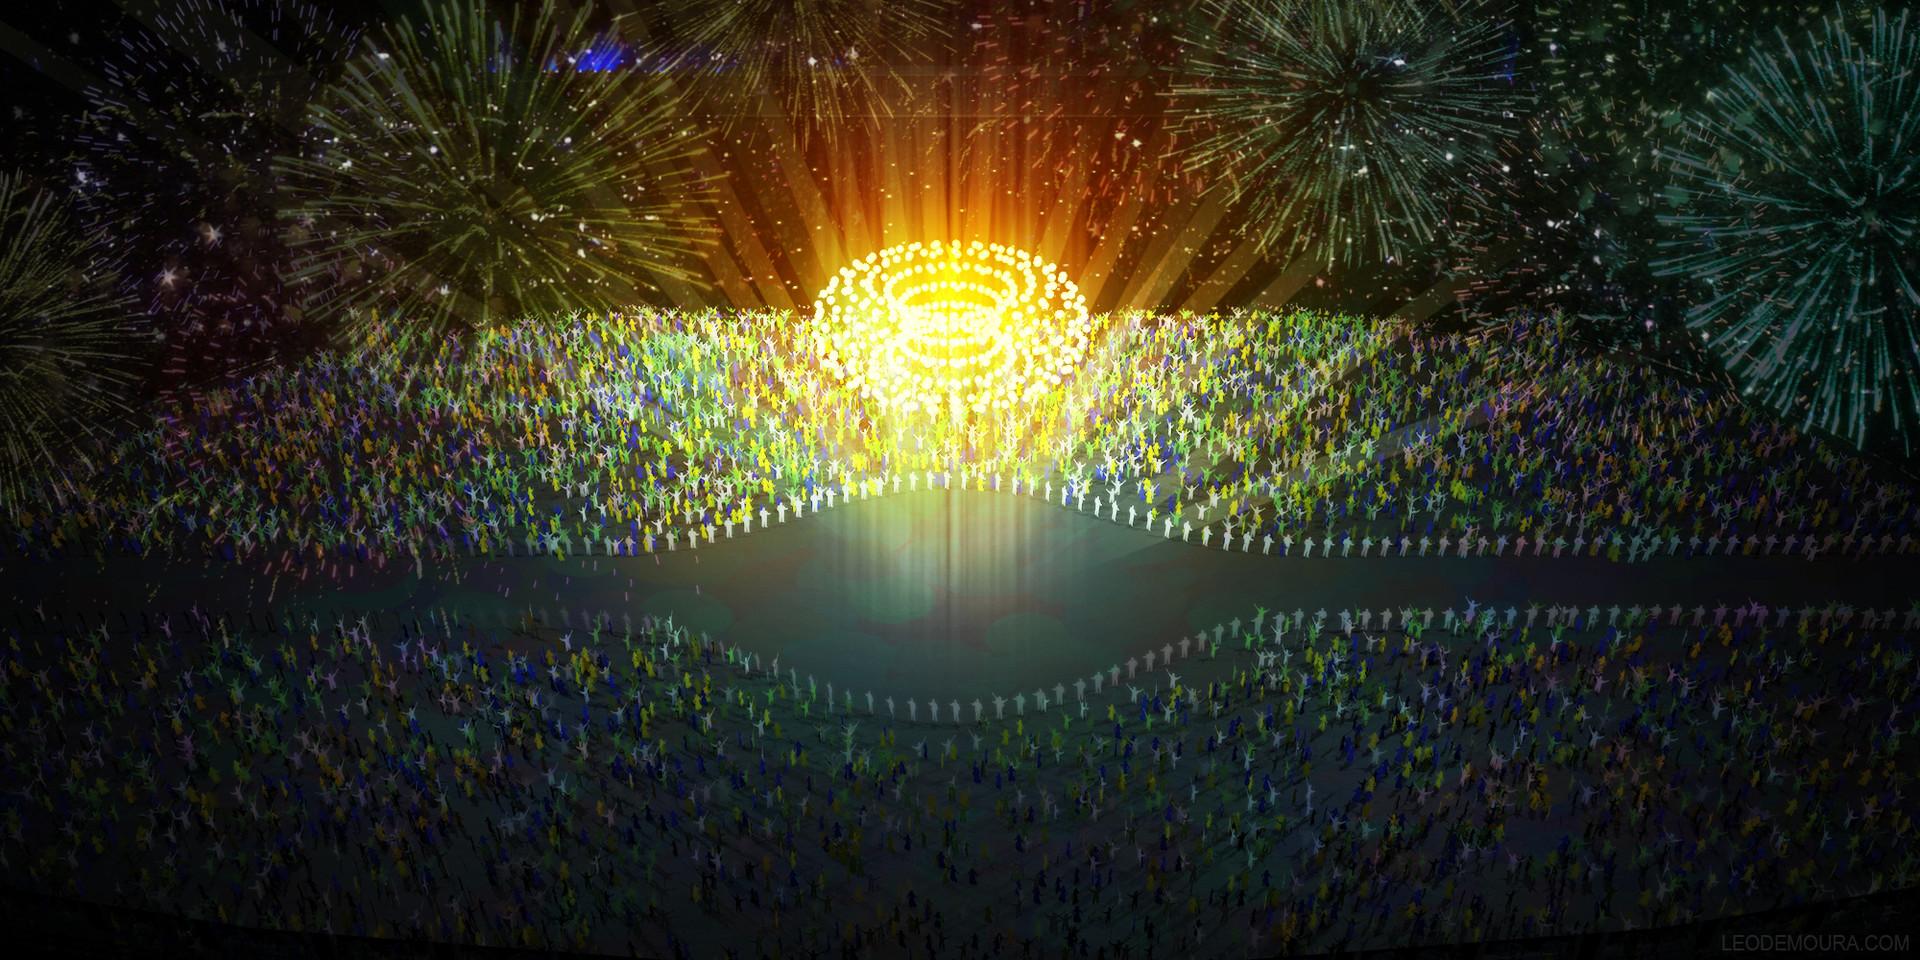 Leonardo de moura art ooc seg olympic cauldron v00 lmo 20150810 edited